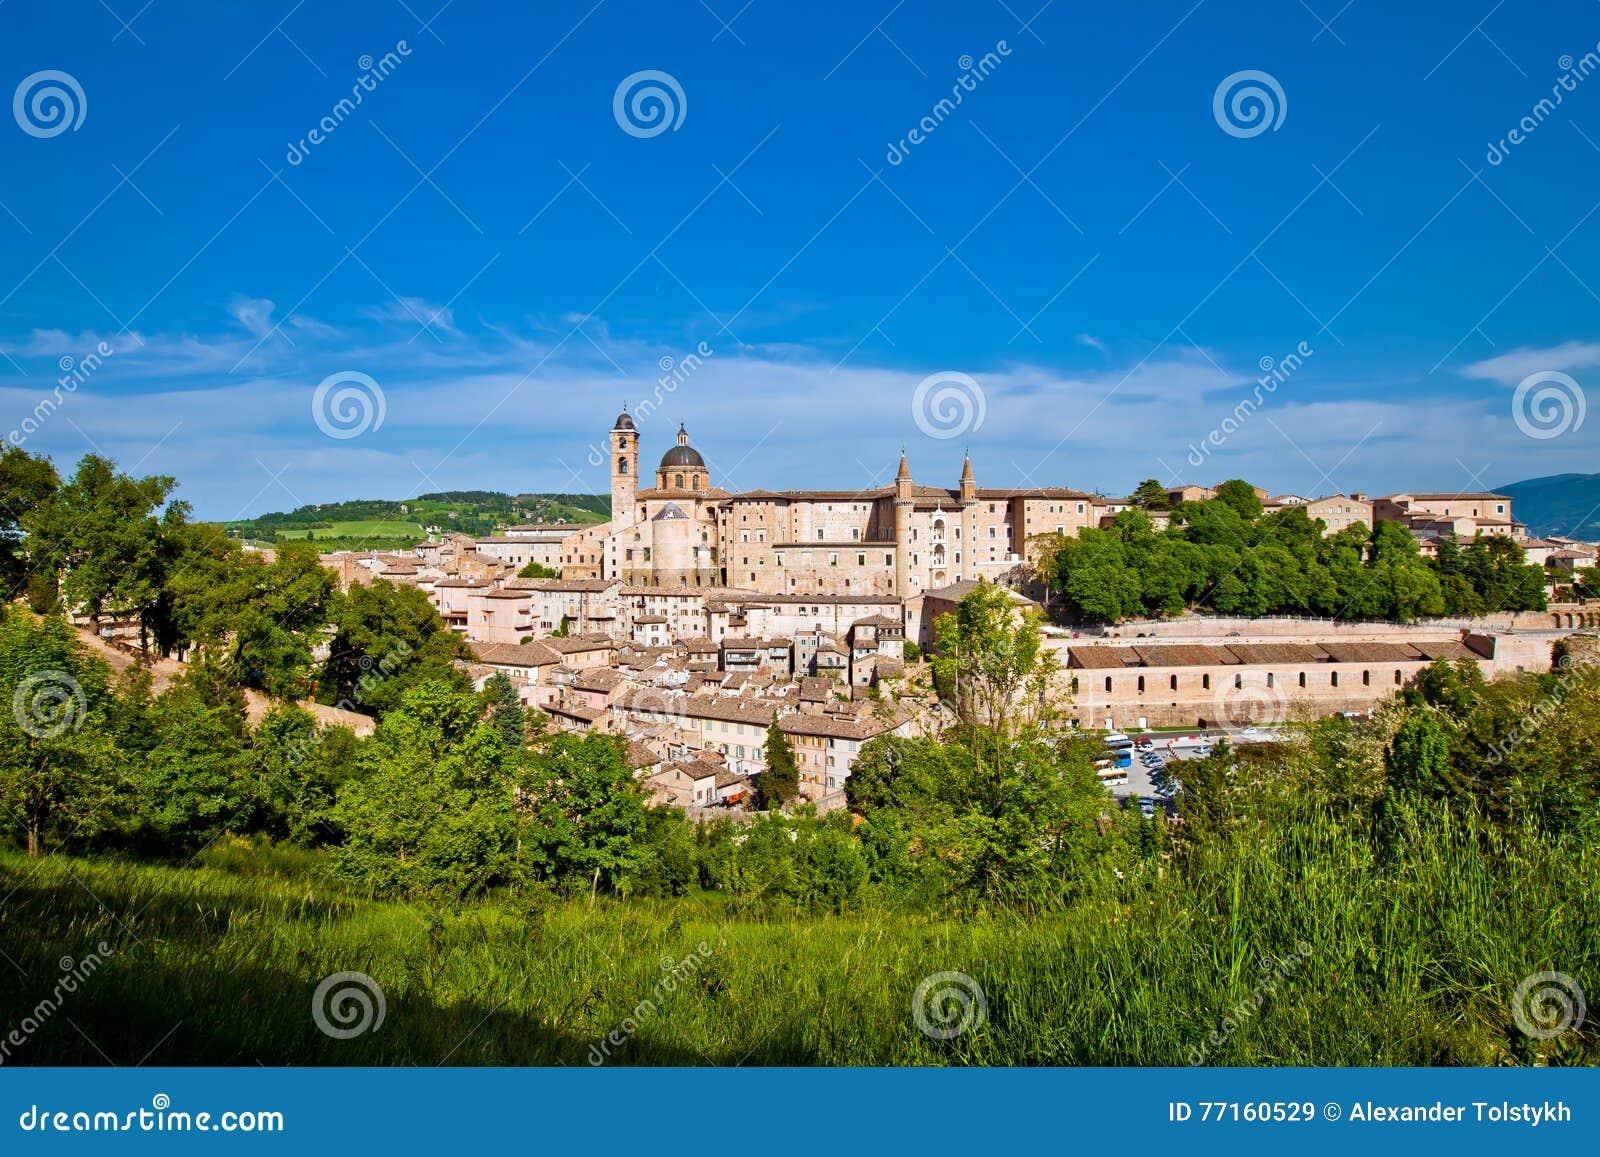 Ville médiévale Urbino en Italie